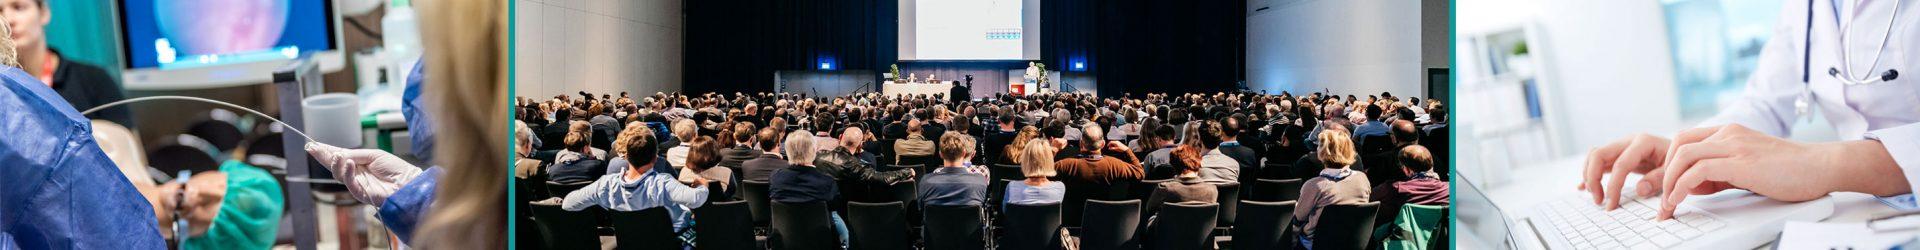 Viszeralmedizin NRW 2019